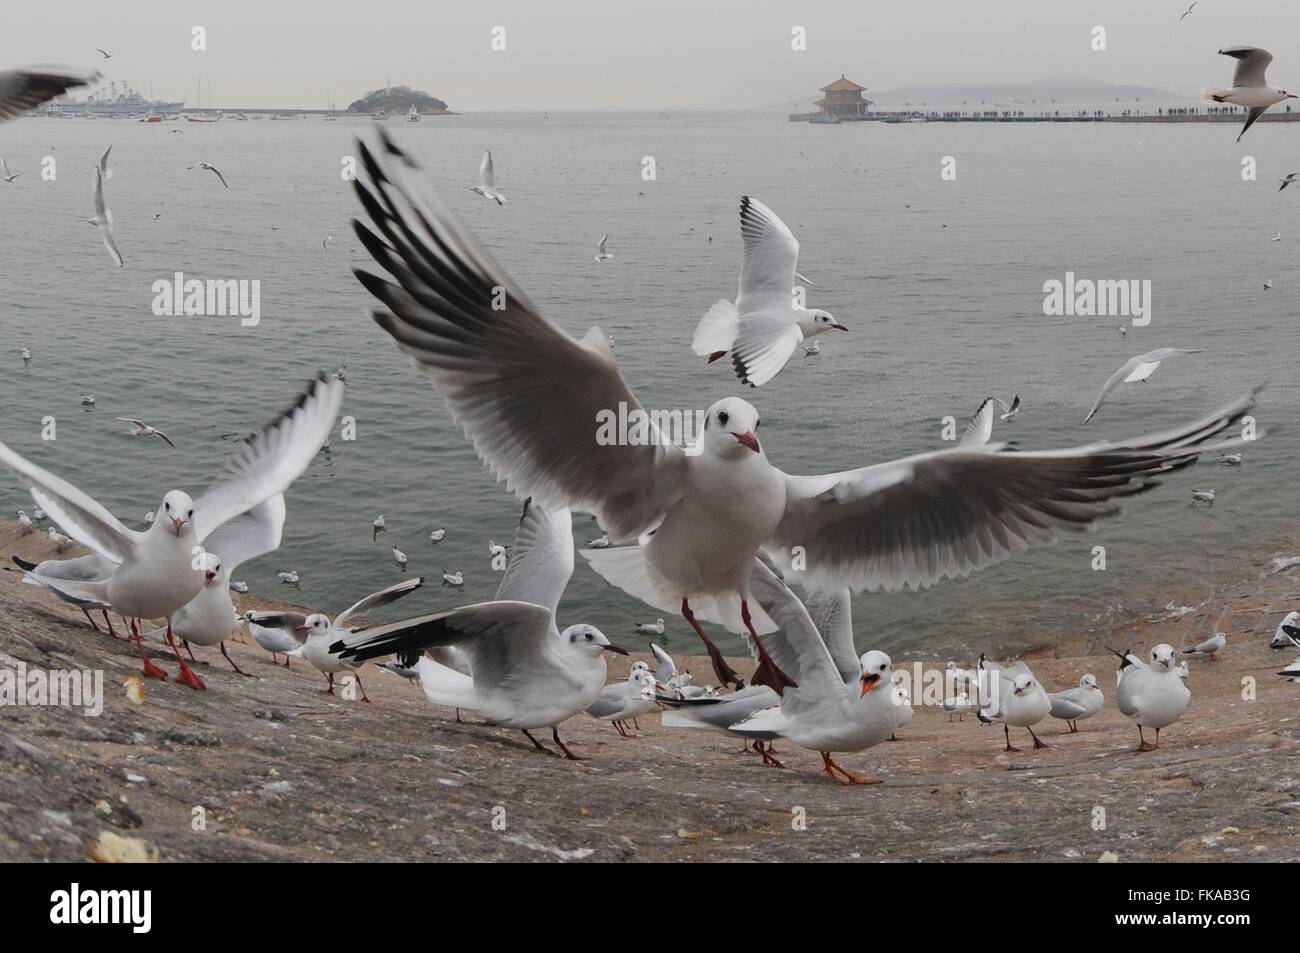 Qingdao, China's Shandong Province. 7th Mar, 2016. Black-headed gulls scramble for food at the Zhanqiao Pier - Stock Image